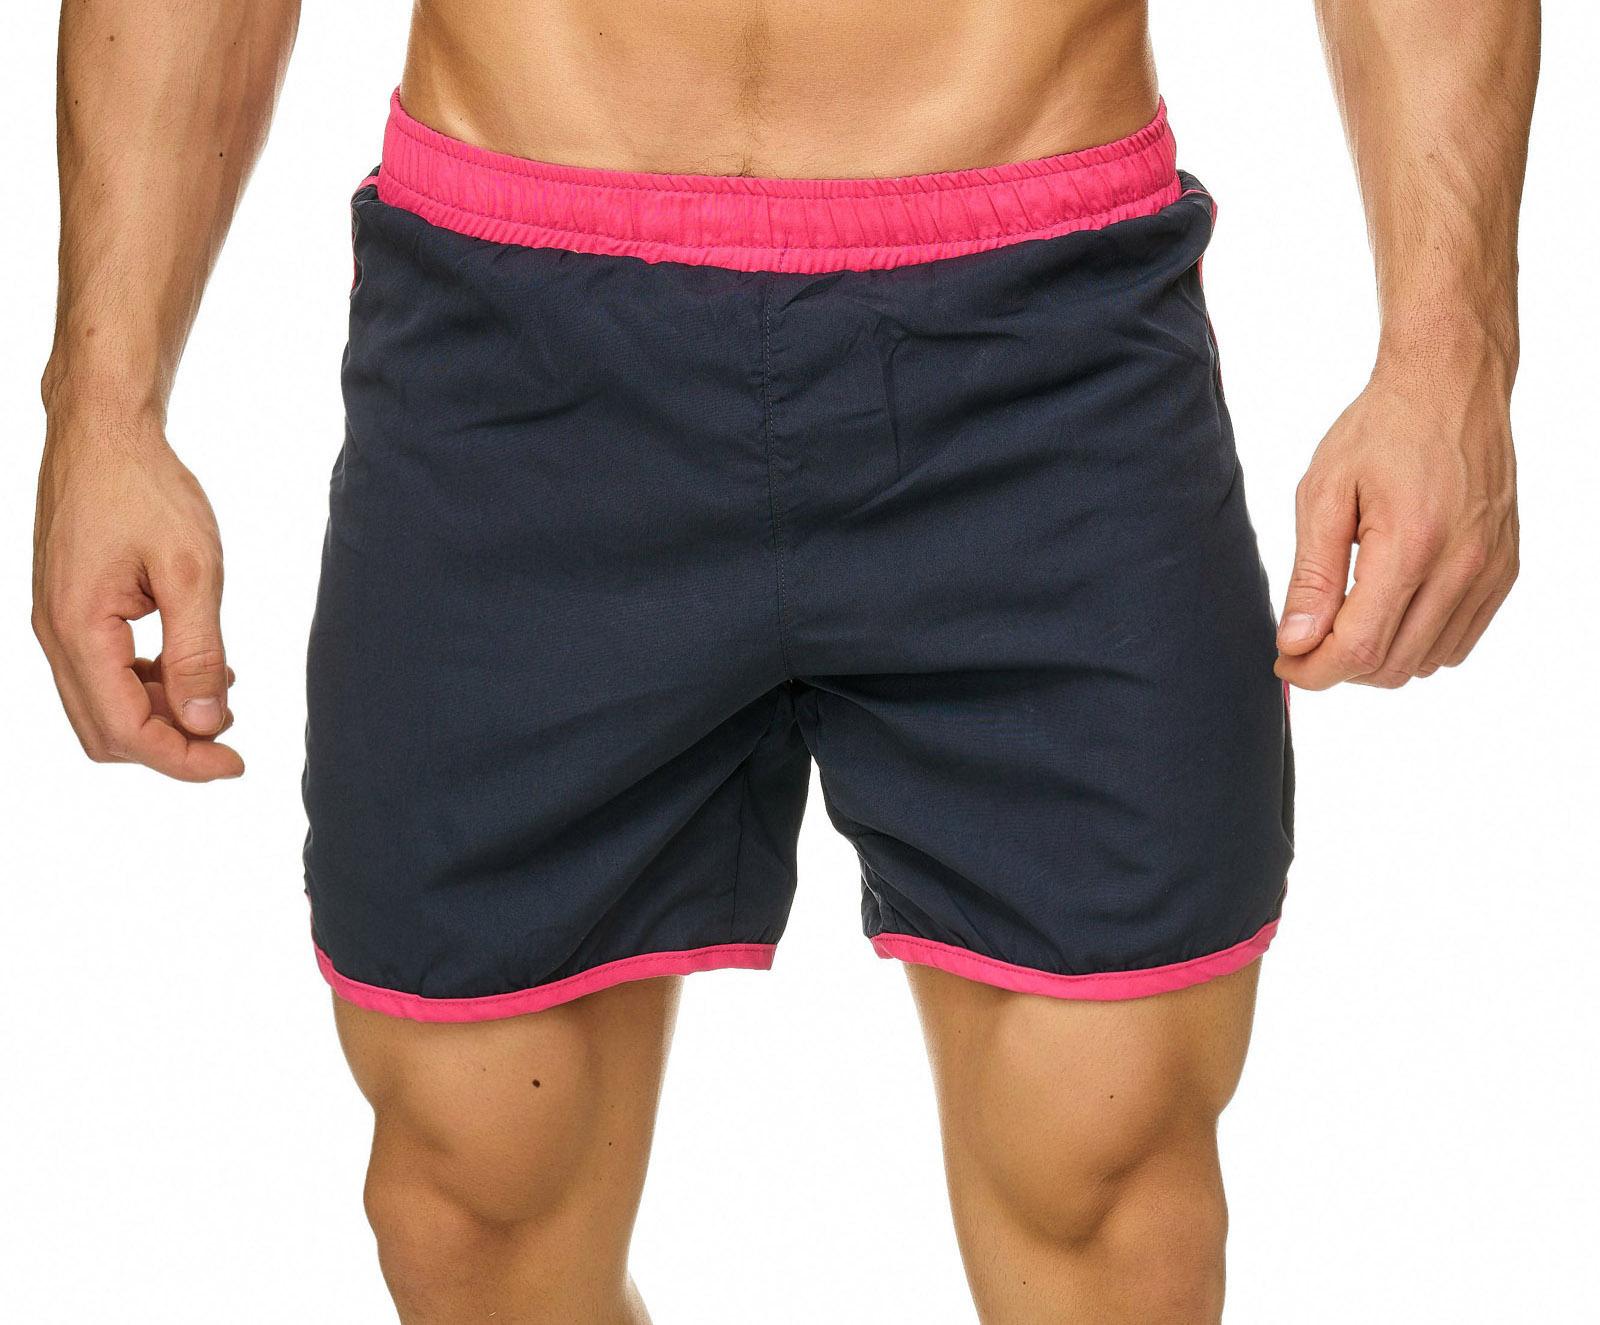 Pantaloncini da bagno nemo arizona shopping.de